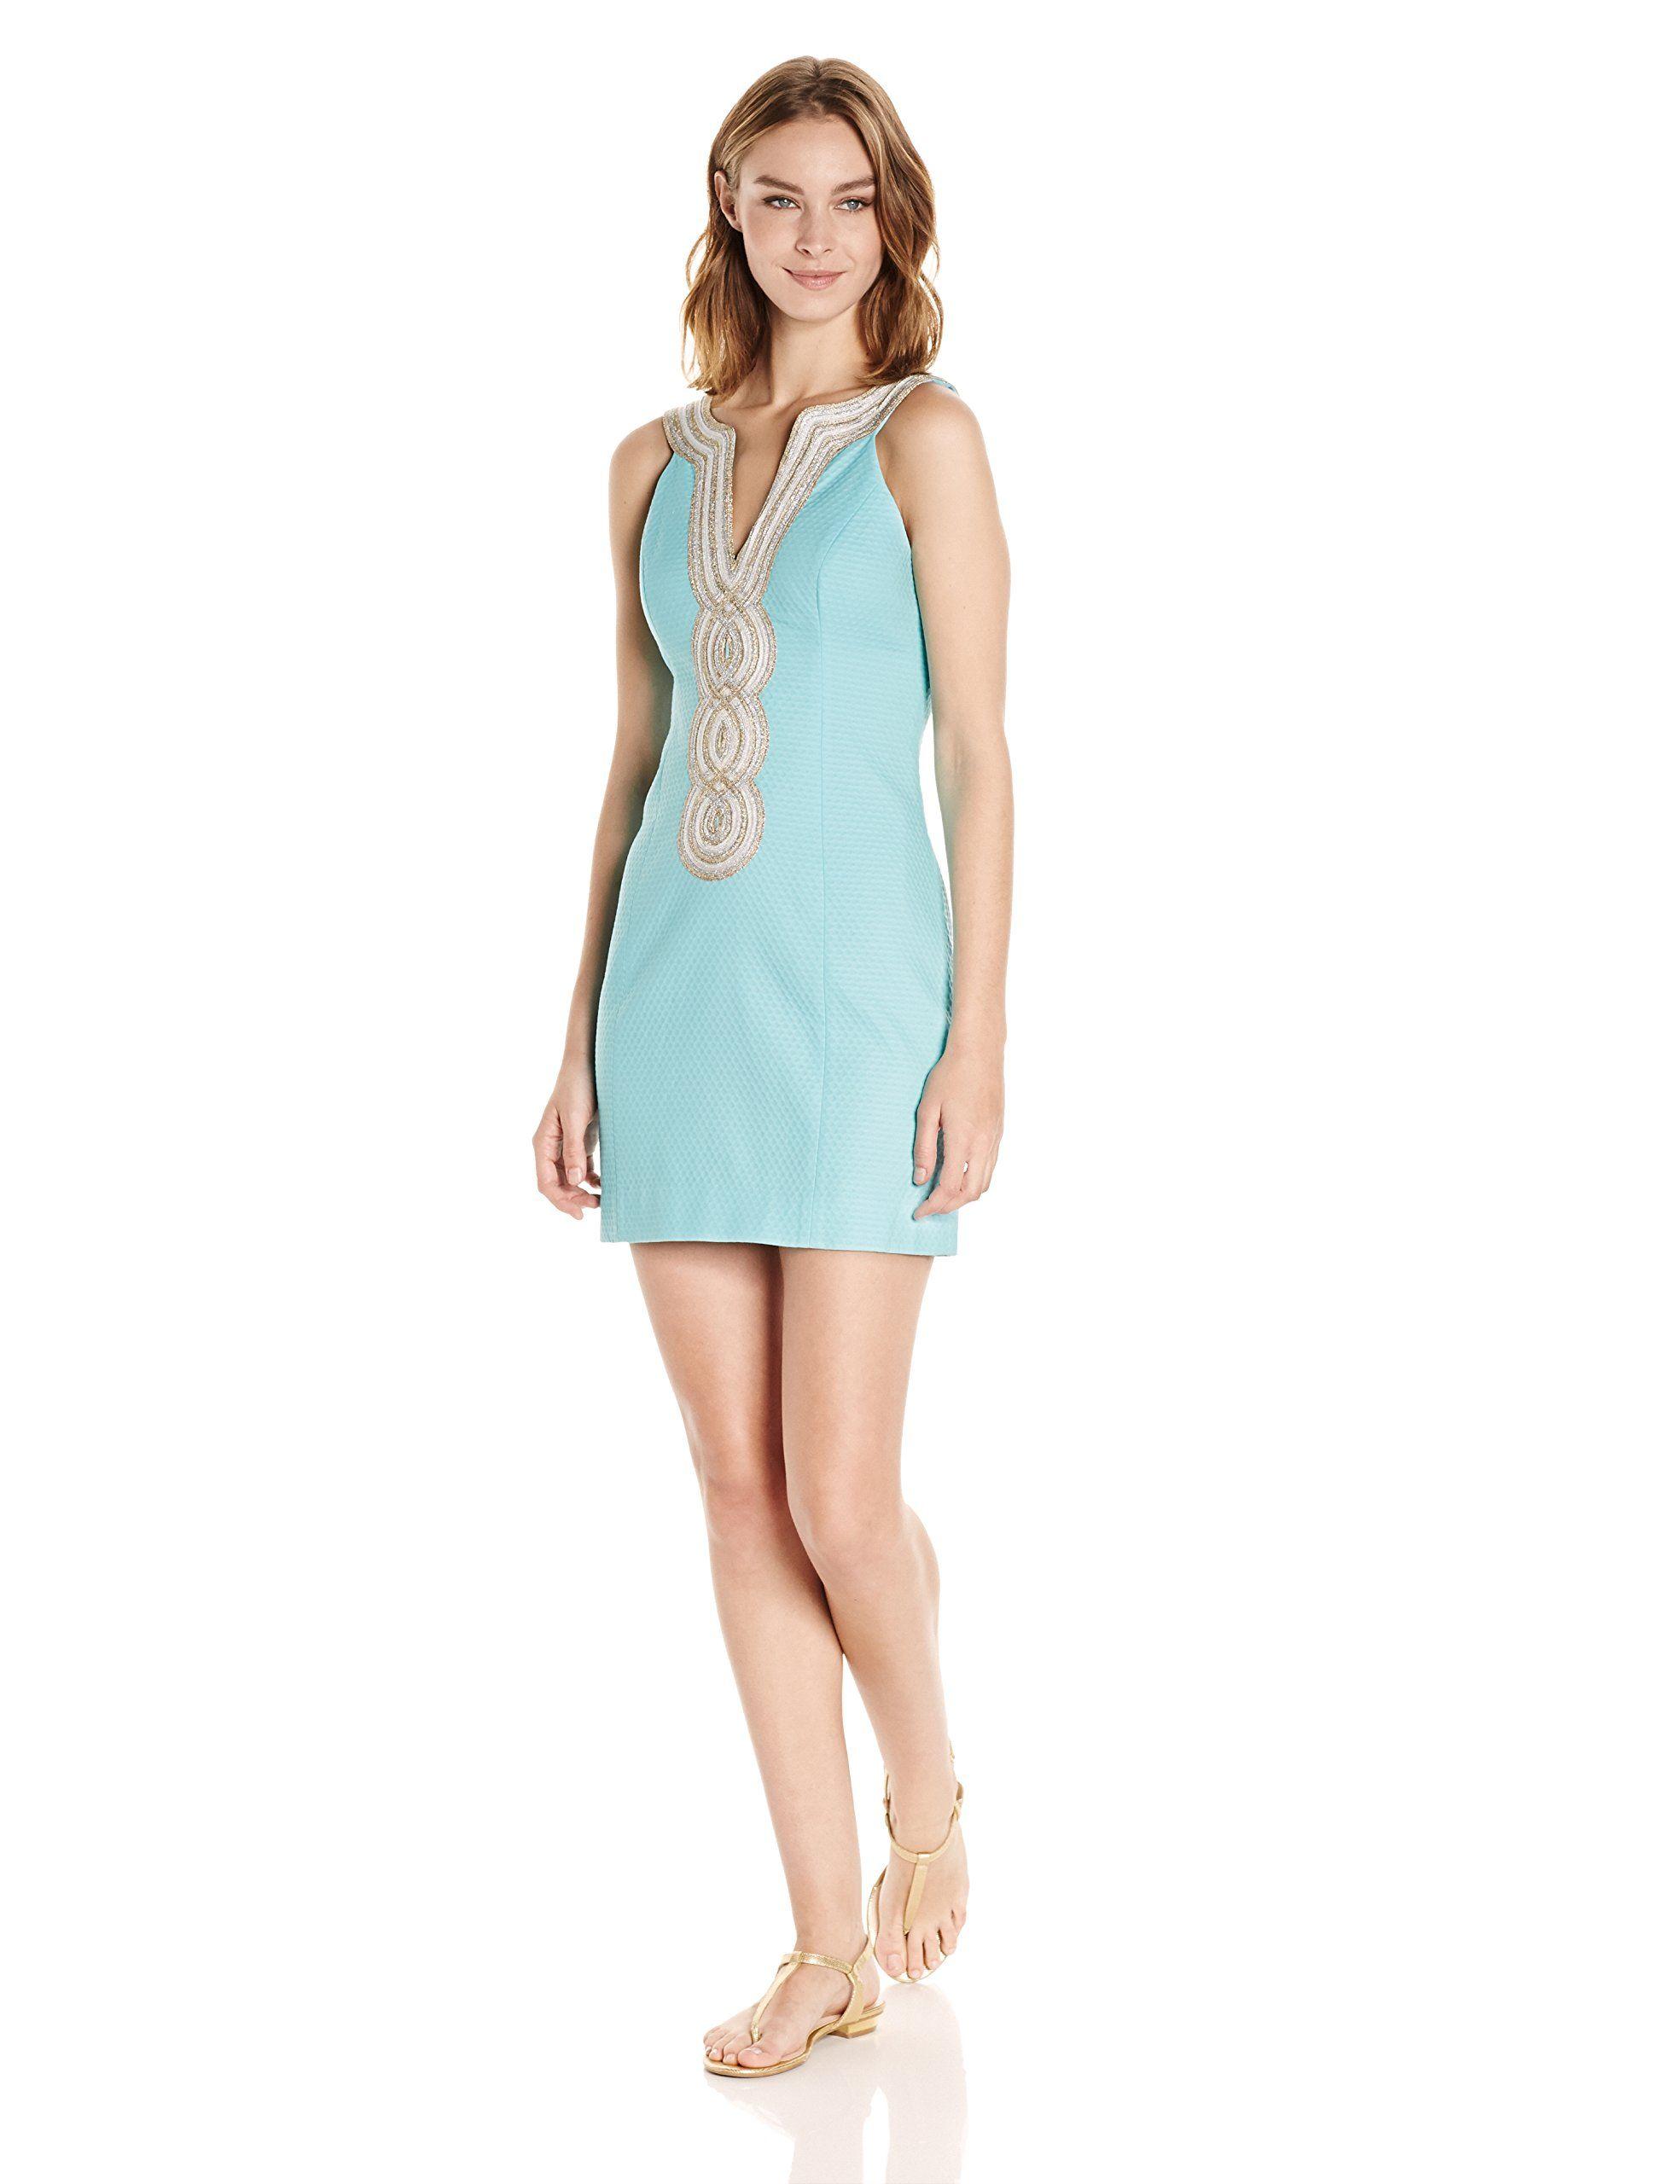 Lilly pulitzer womenus valli shift serene blue apparel pinterest